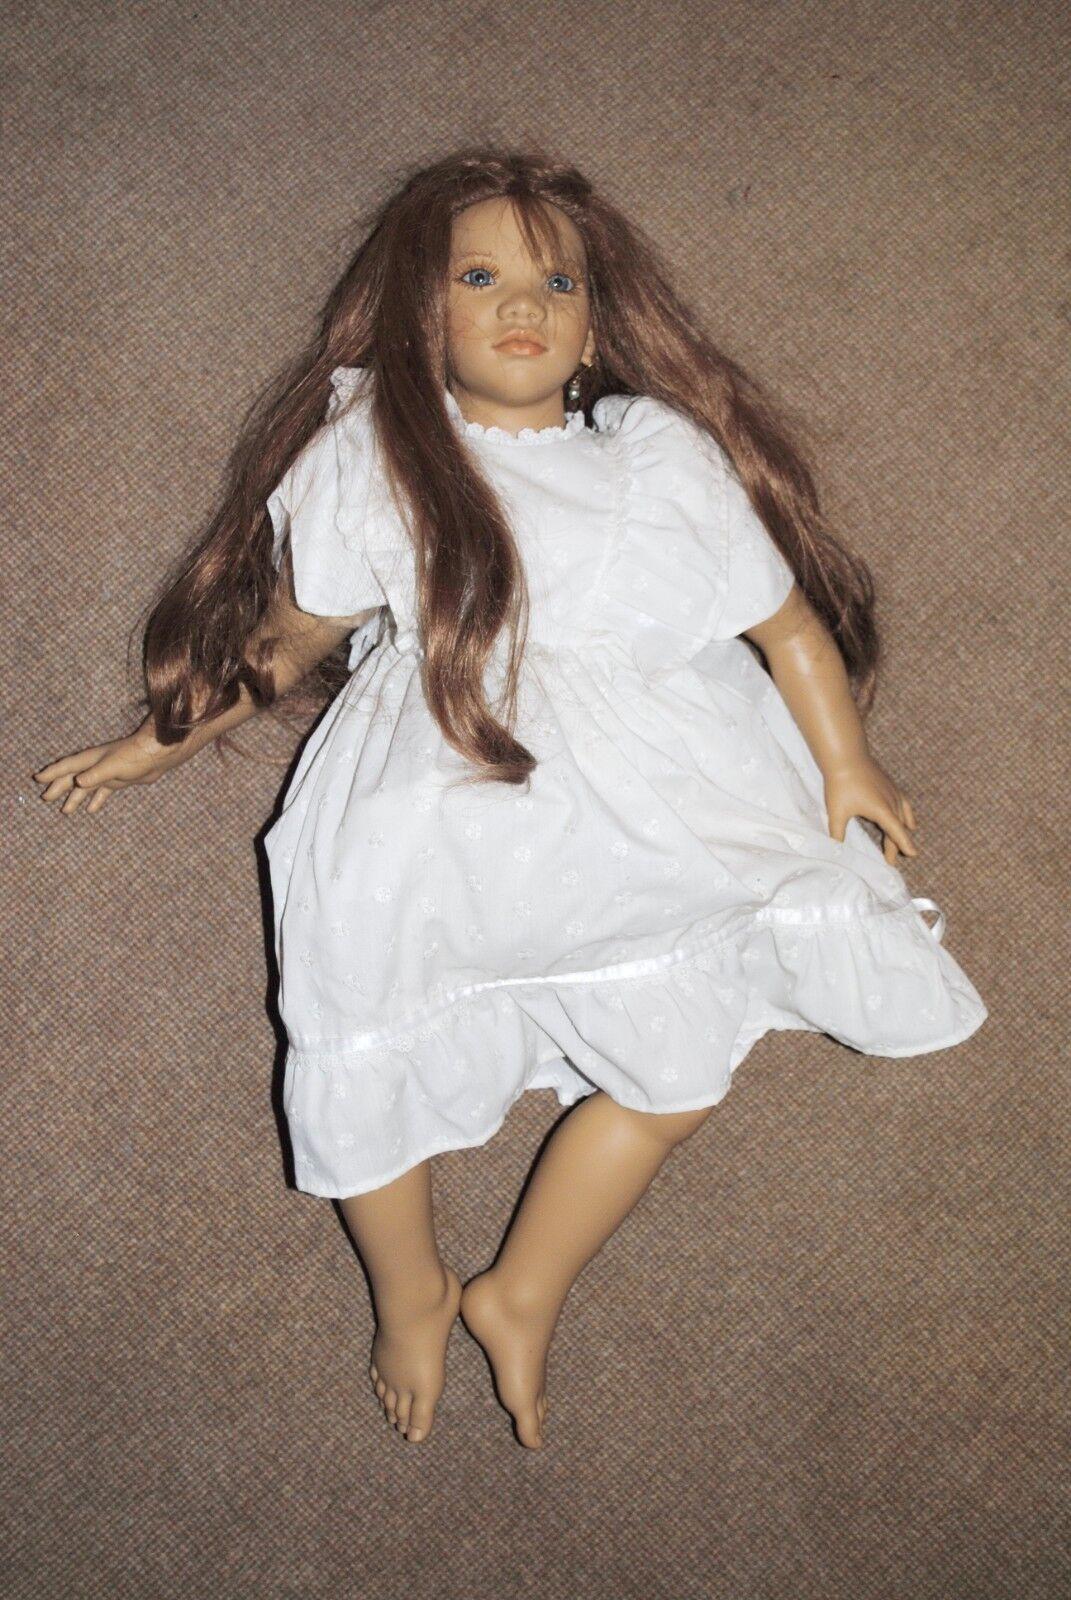 prestigio l @ @ k  Annette Himstedt muñeca-sin usar-Top-Grosse muñeca nº 1